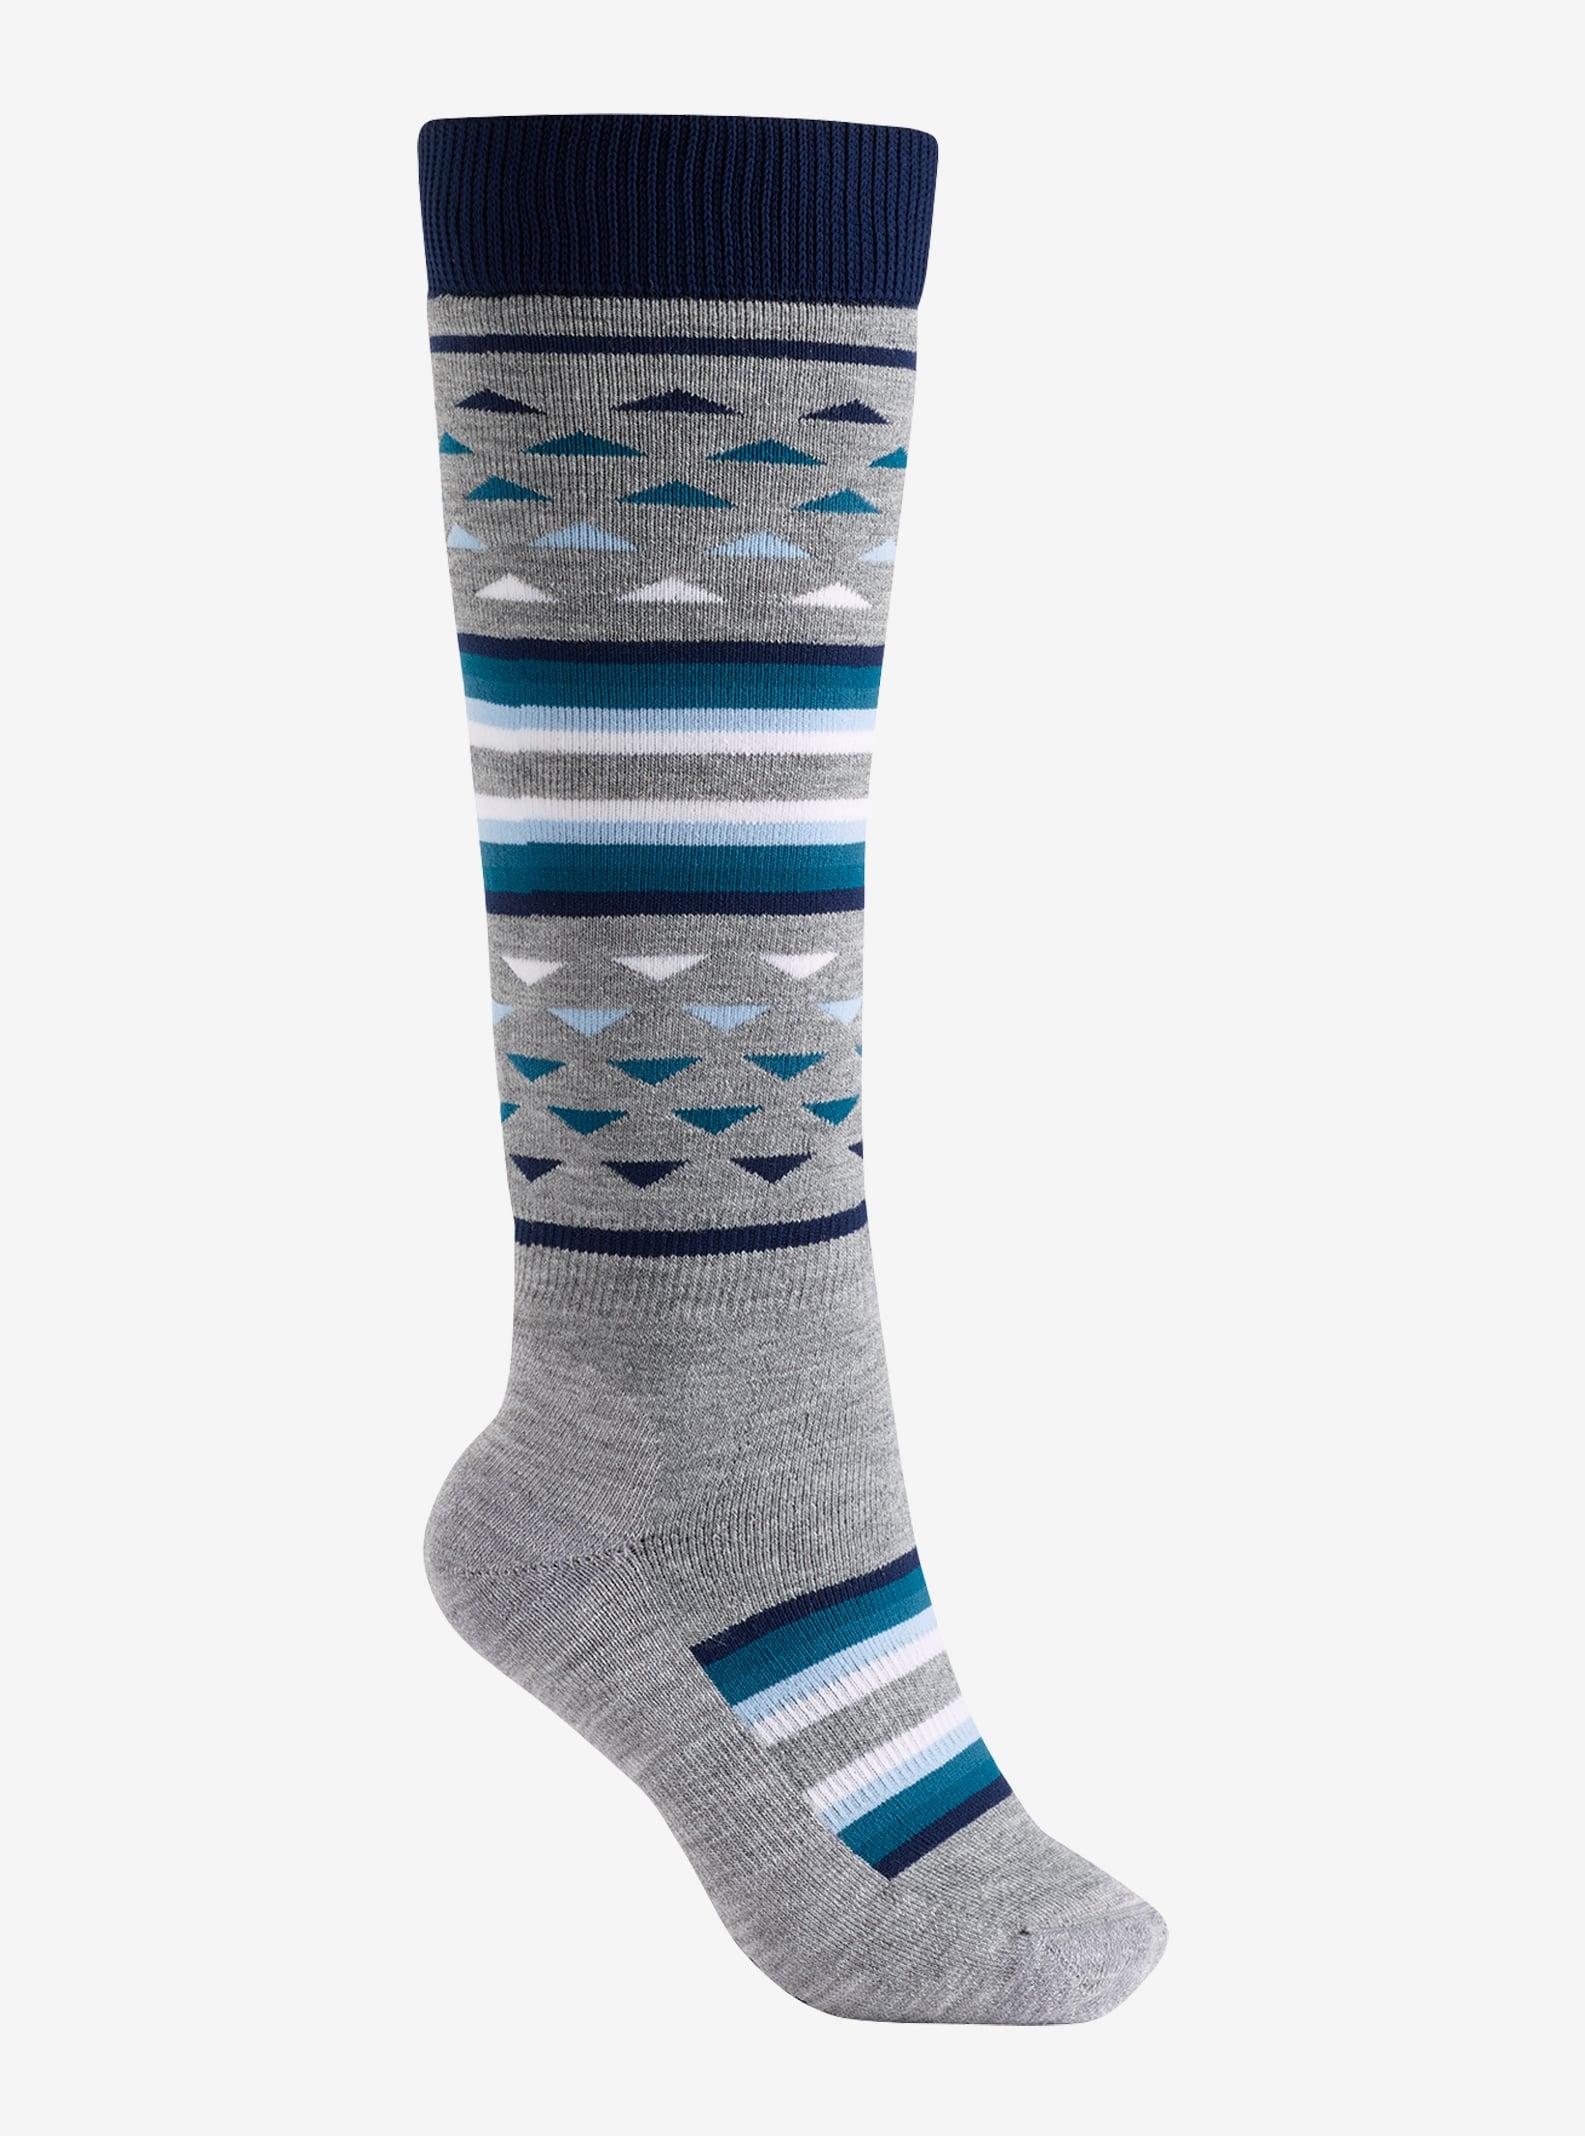 Women's Burton Shadow Sock shown in Mood Indigo